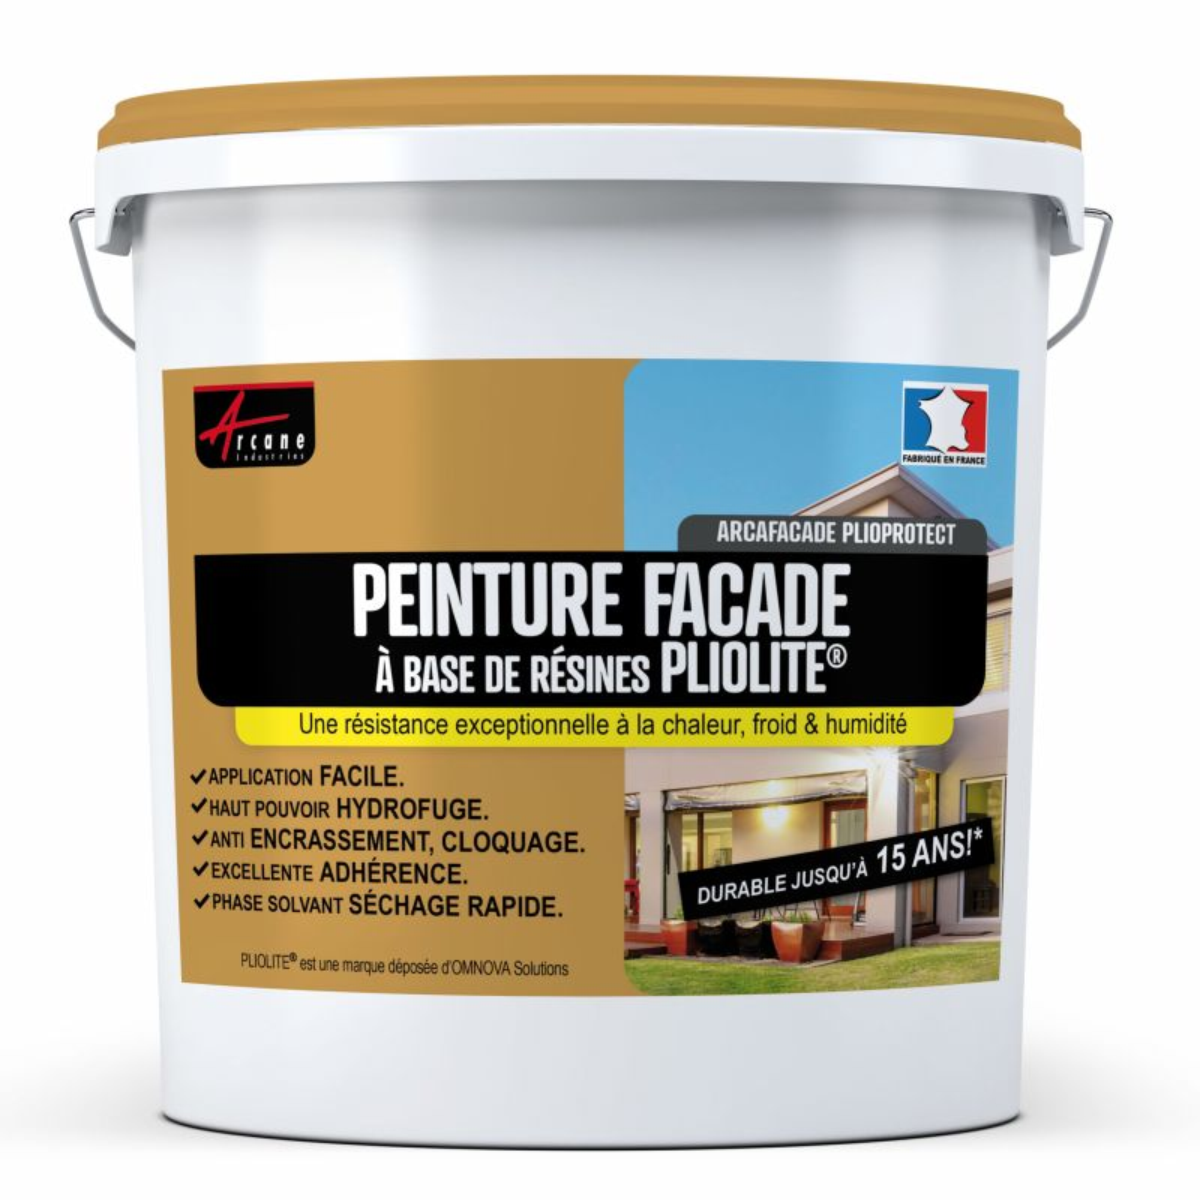 Peinture Façade Pliolite - ARCAFAÇADE PLIOPROTECT